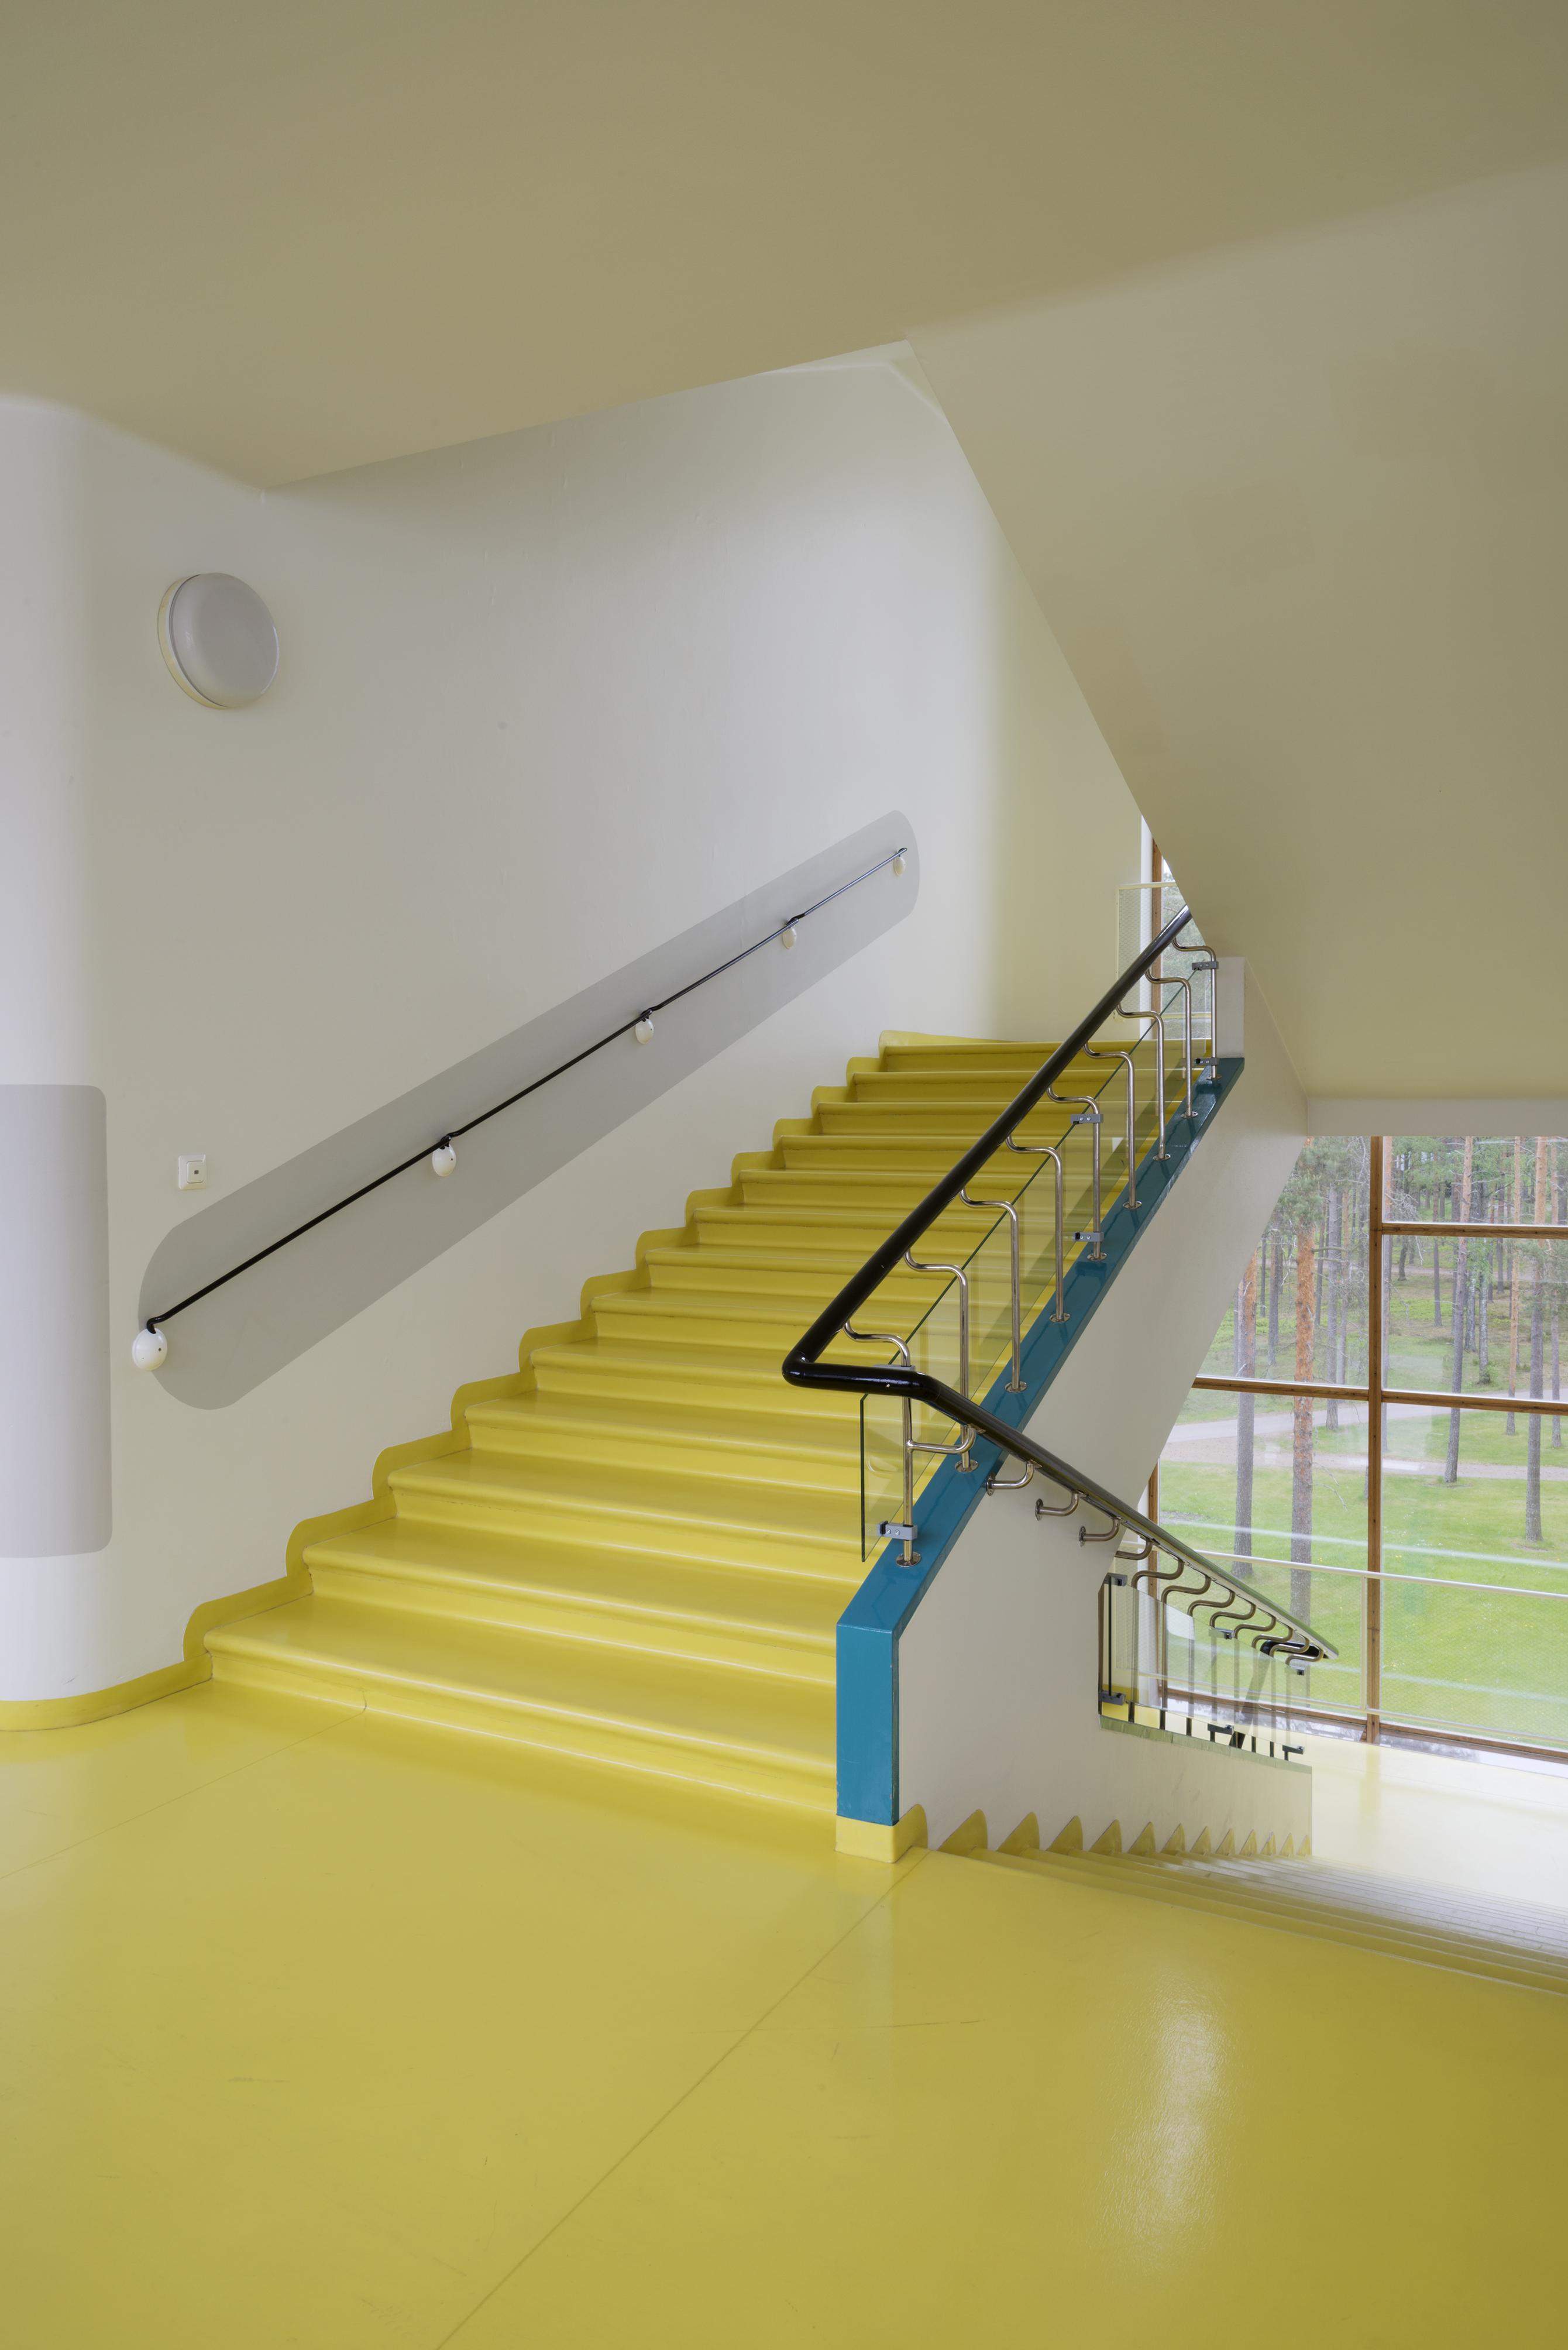 staircase at Paimio sanatorium